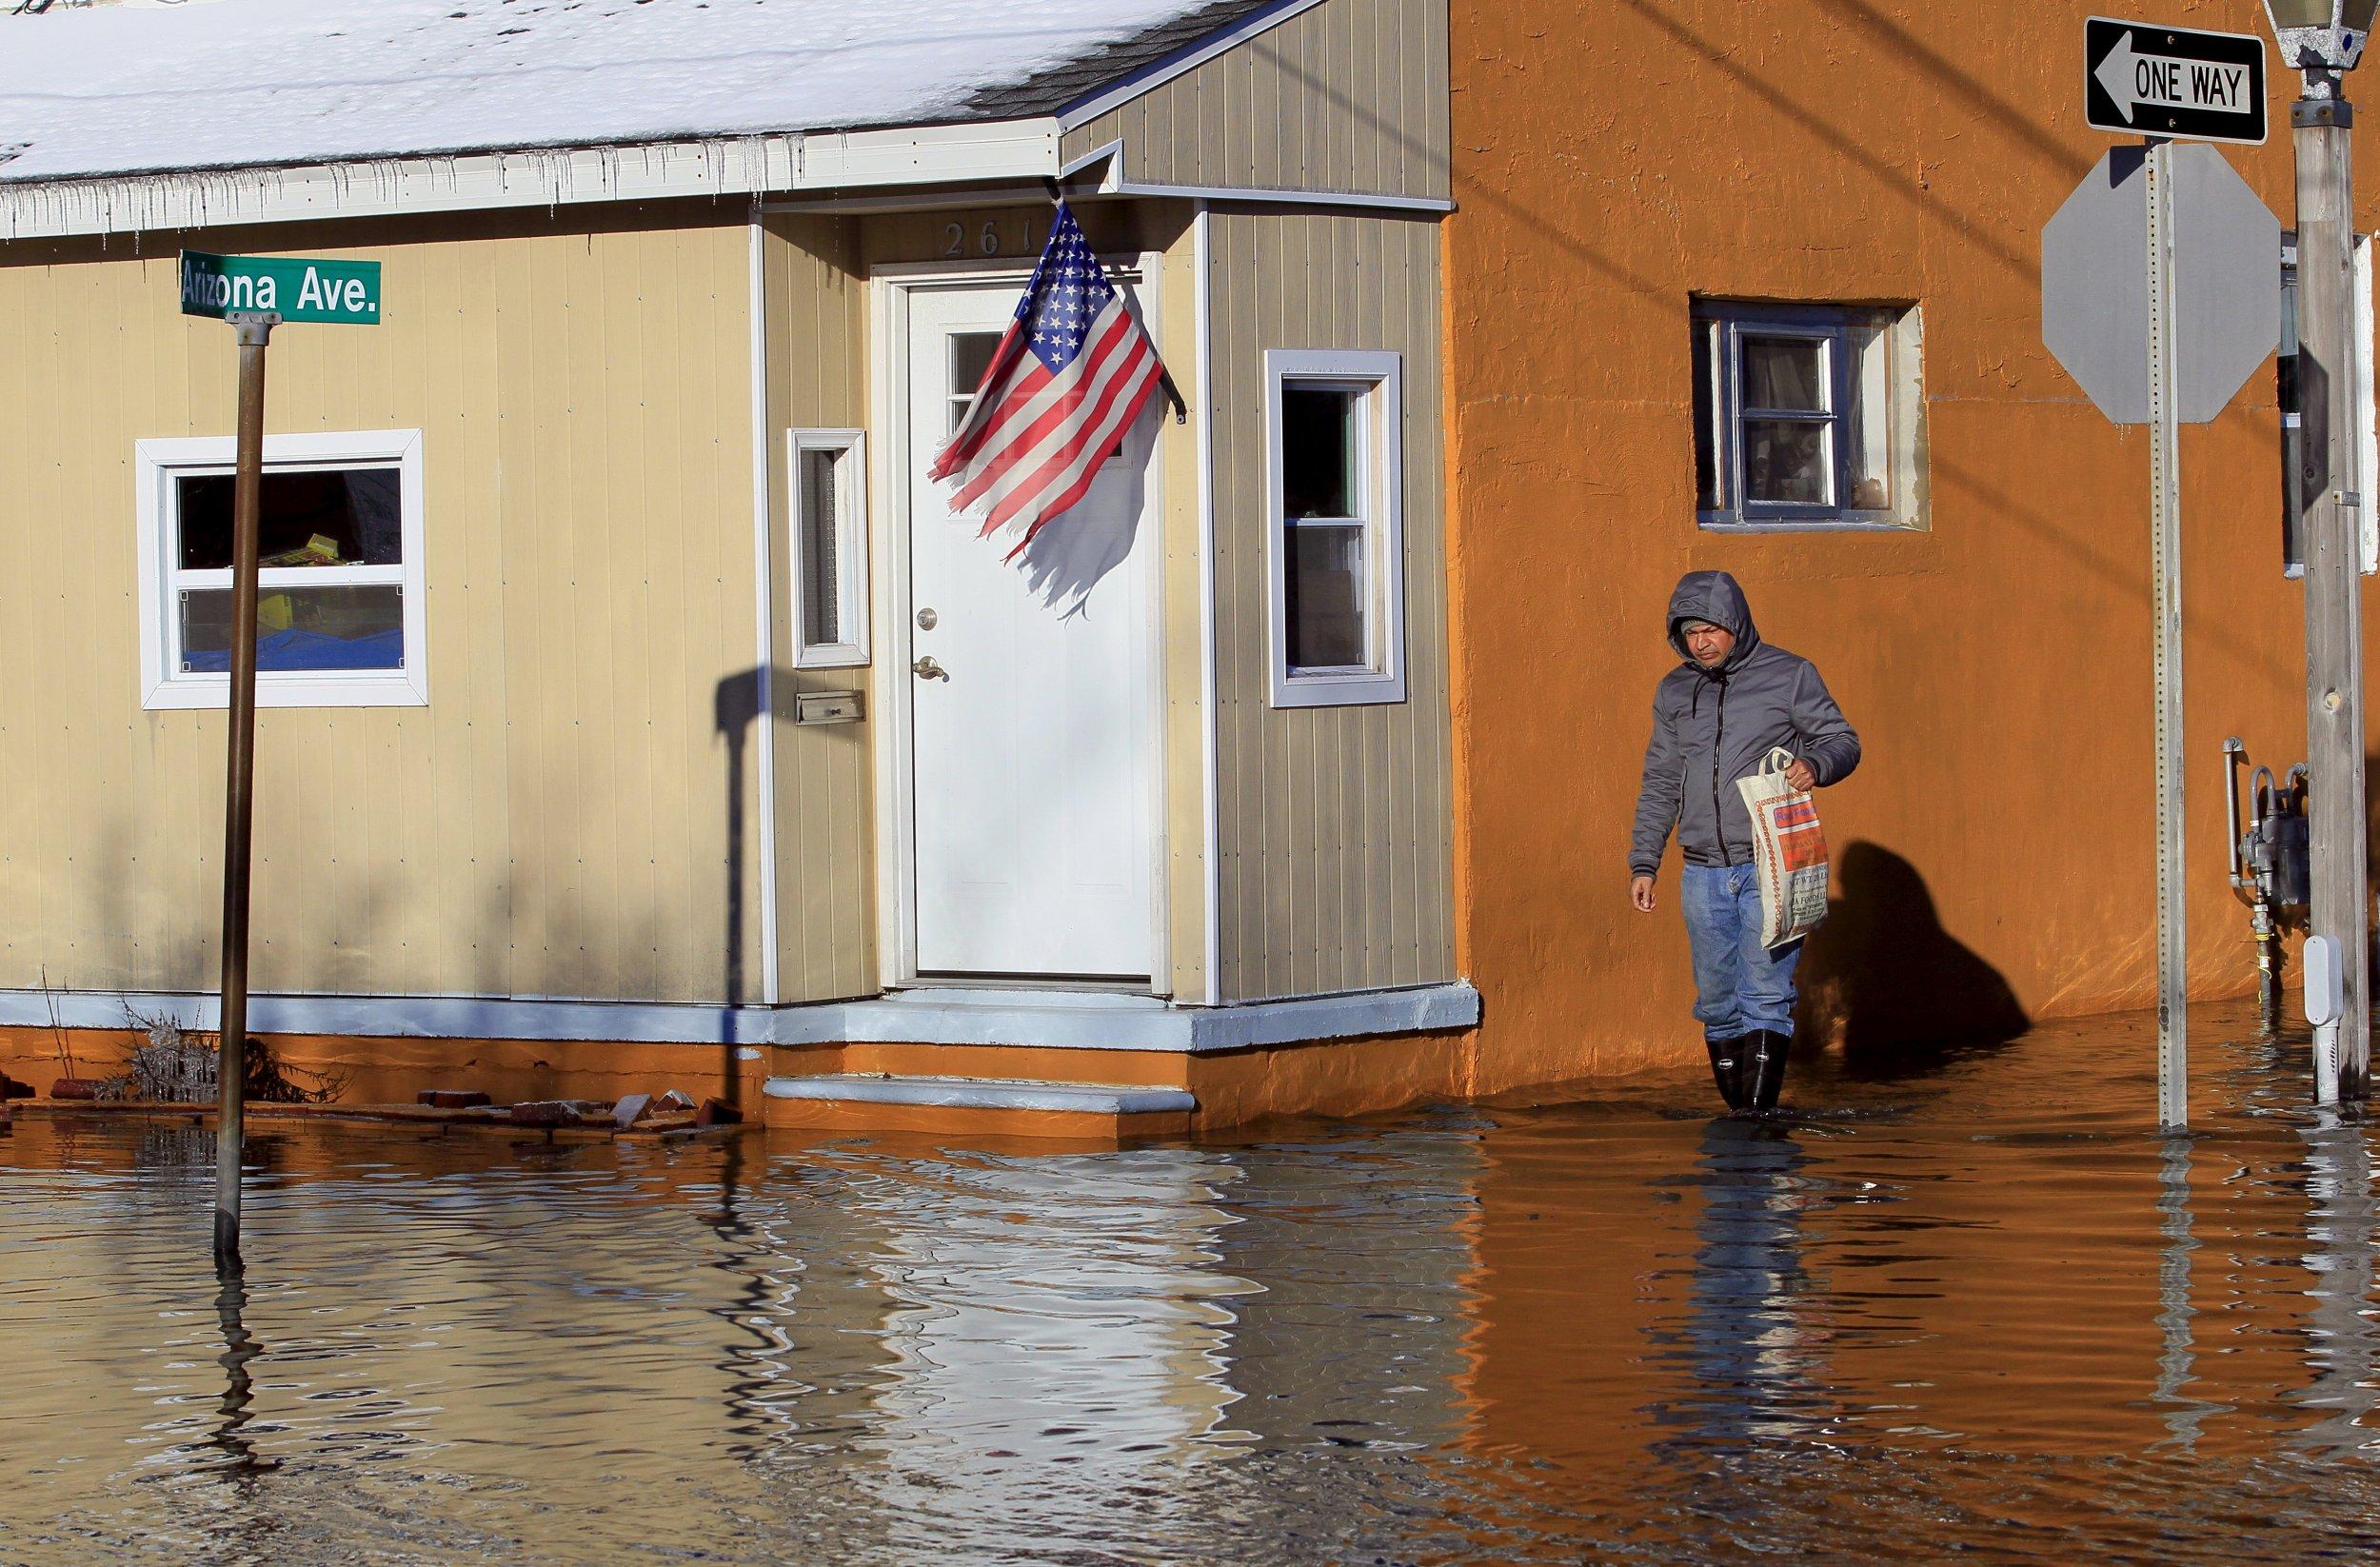 Man Wades Through Flooded Street